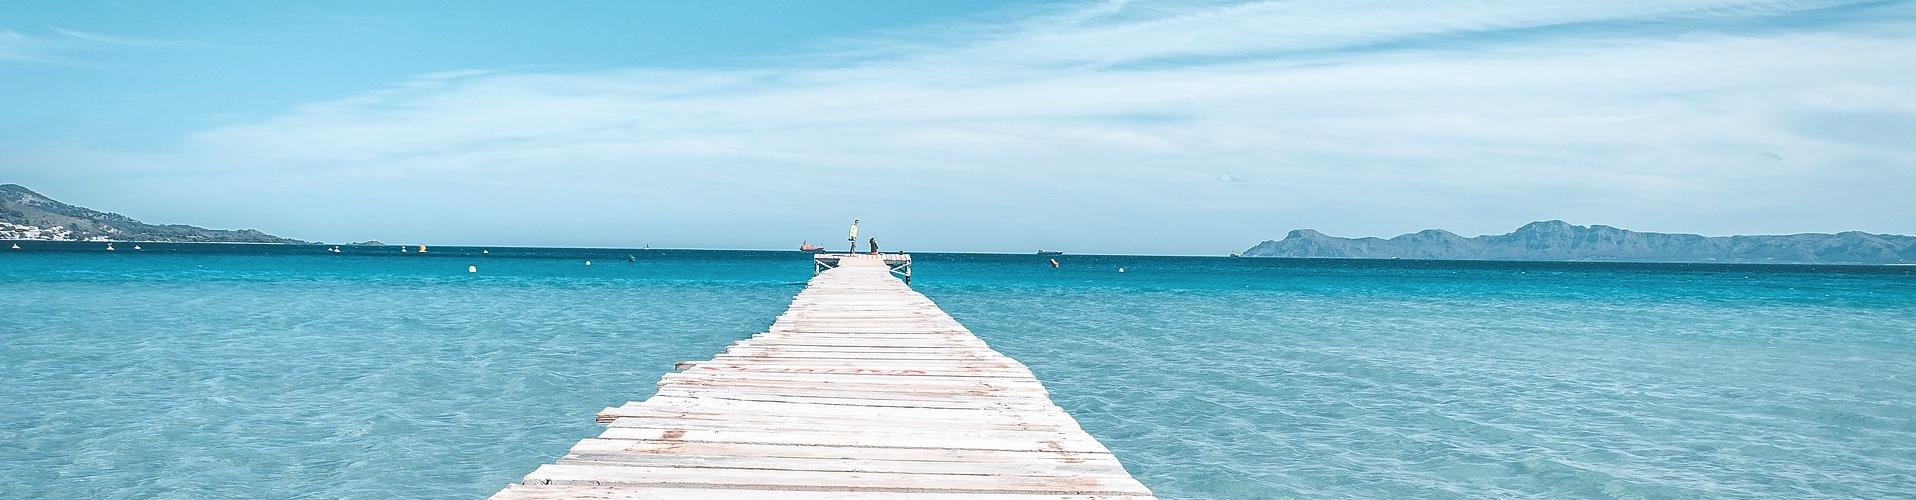 Majorka plaża pomost